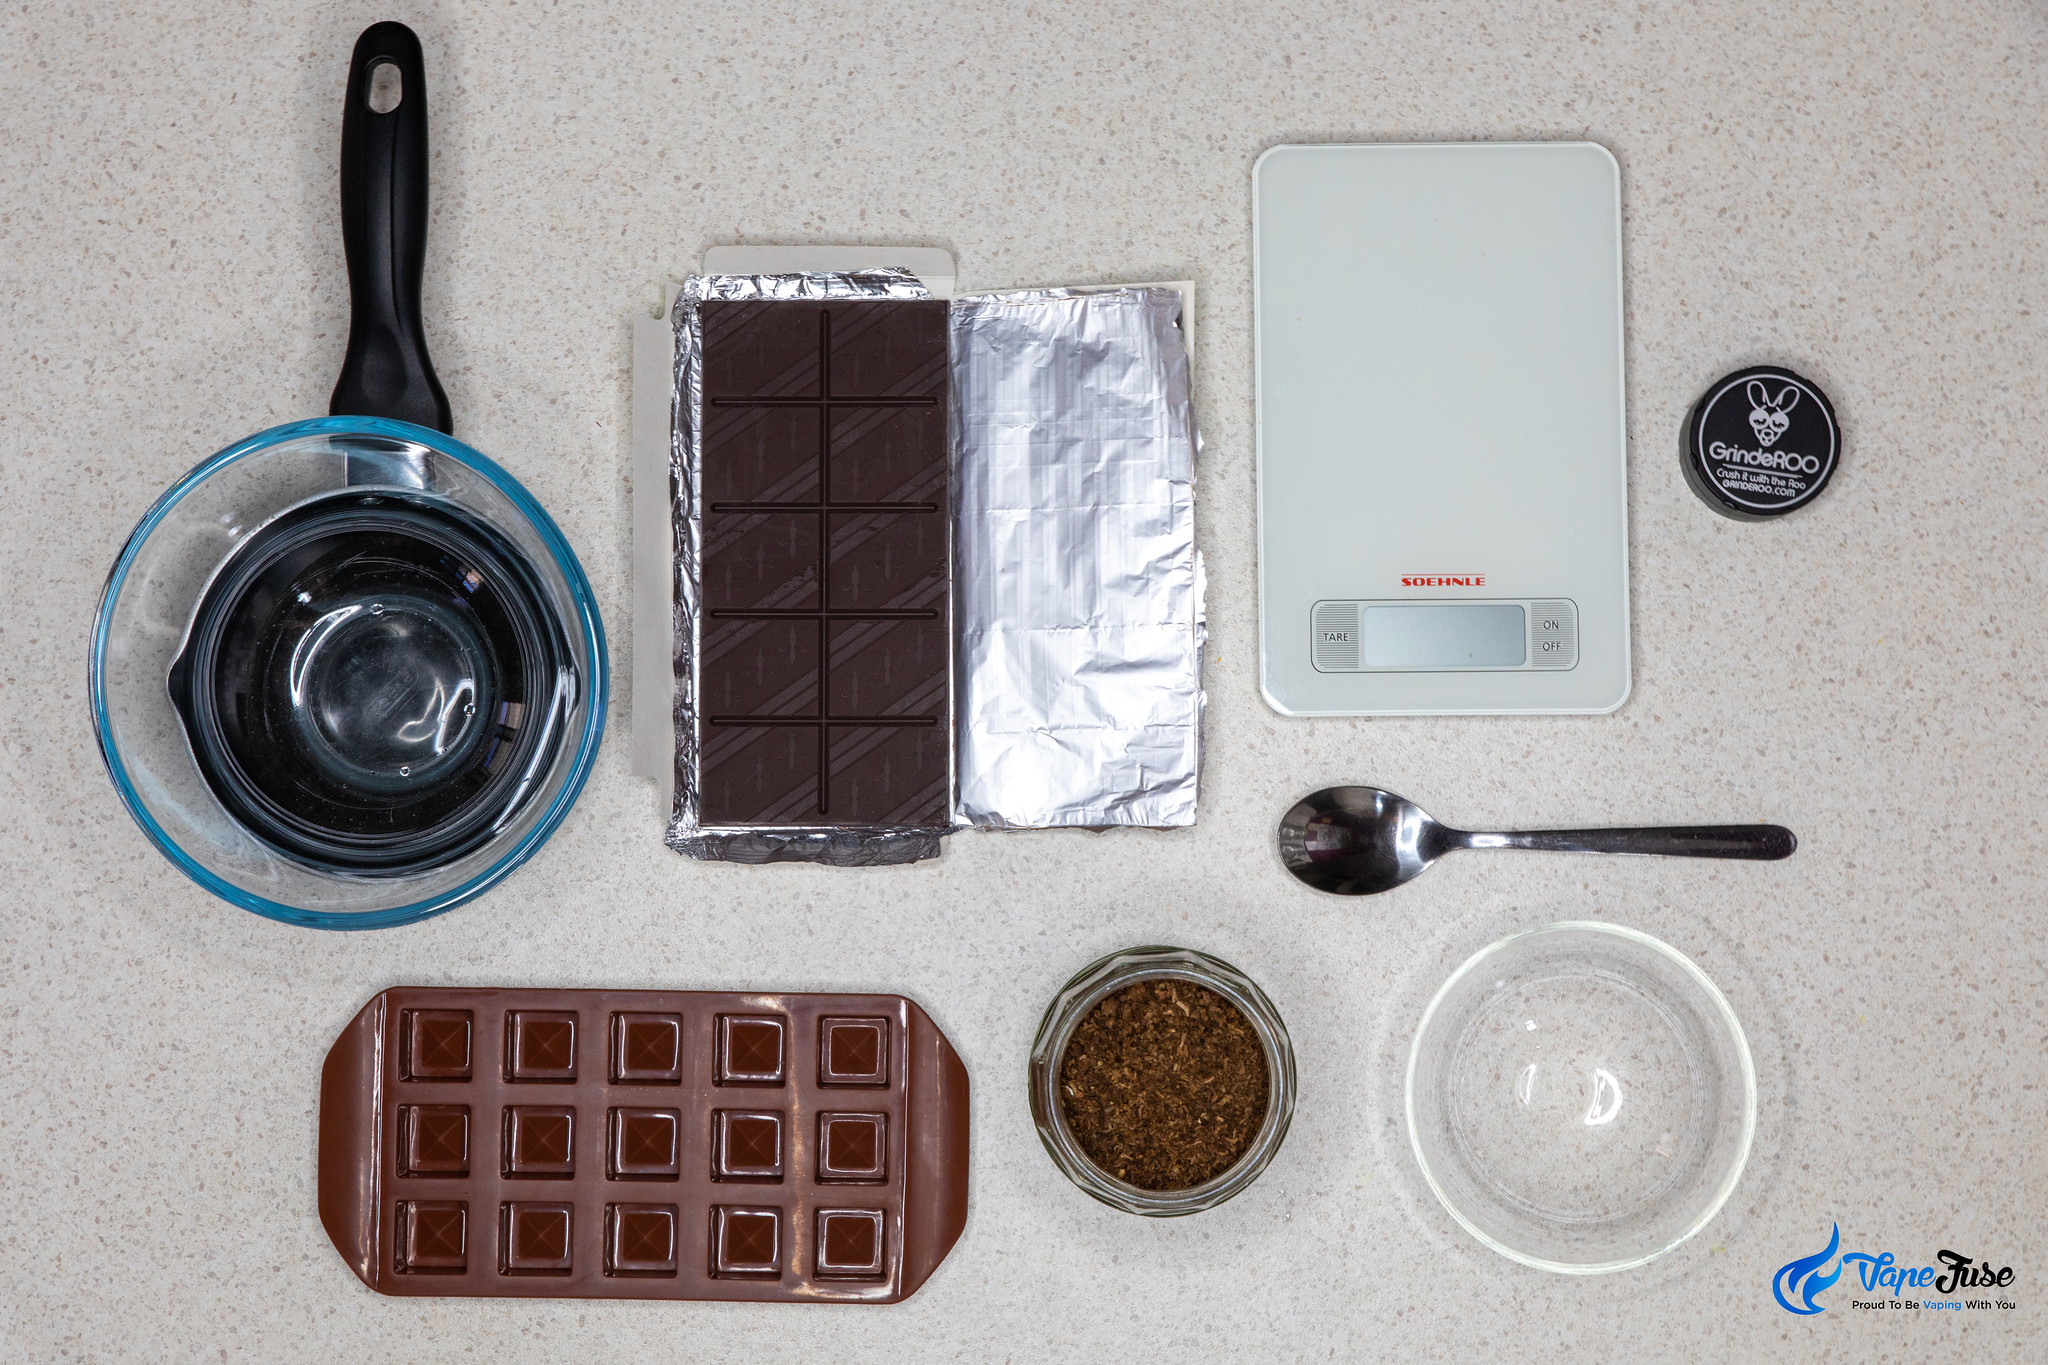 What you need to make Cannabis AVB infused chocolate